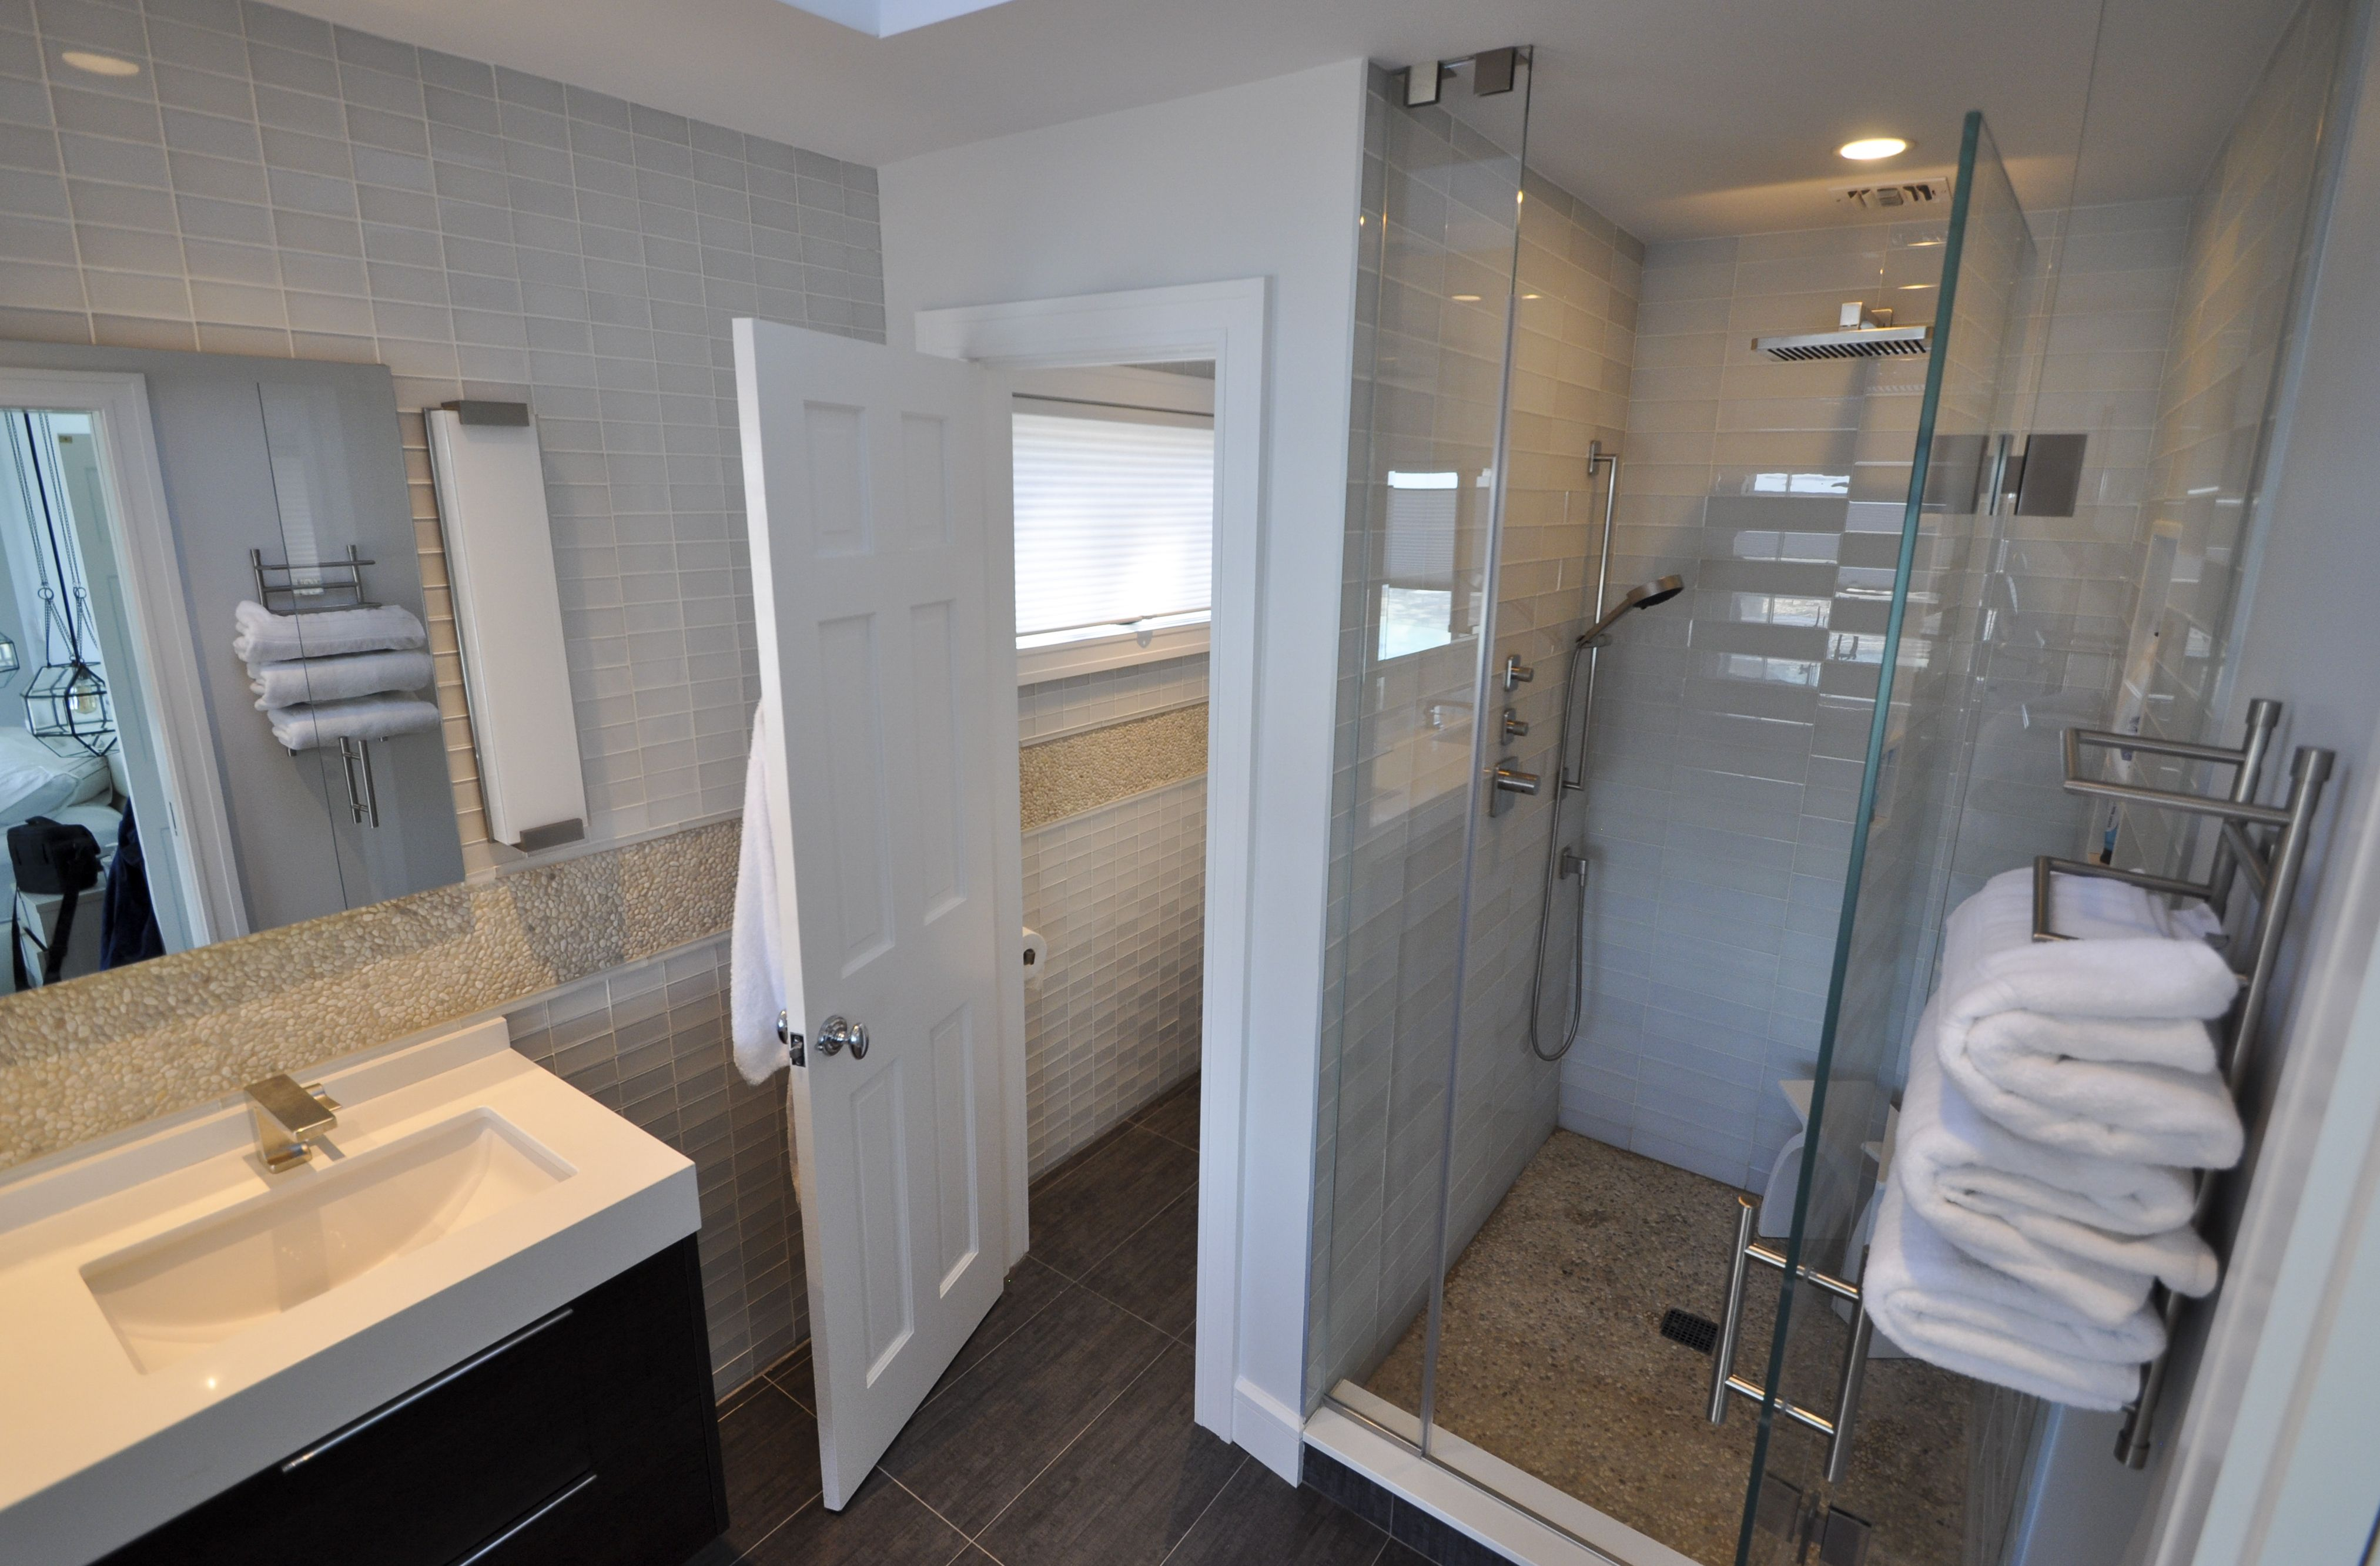 Bathrooms In 2020 Bathroom Decor Bathroom Design Master Bathroom